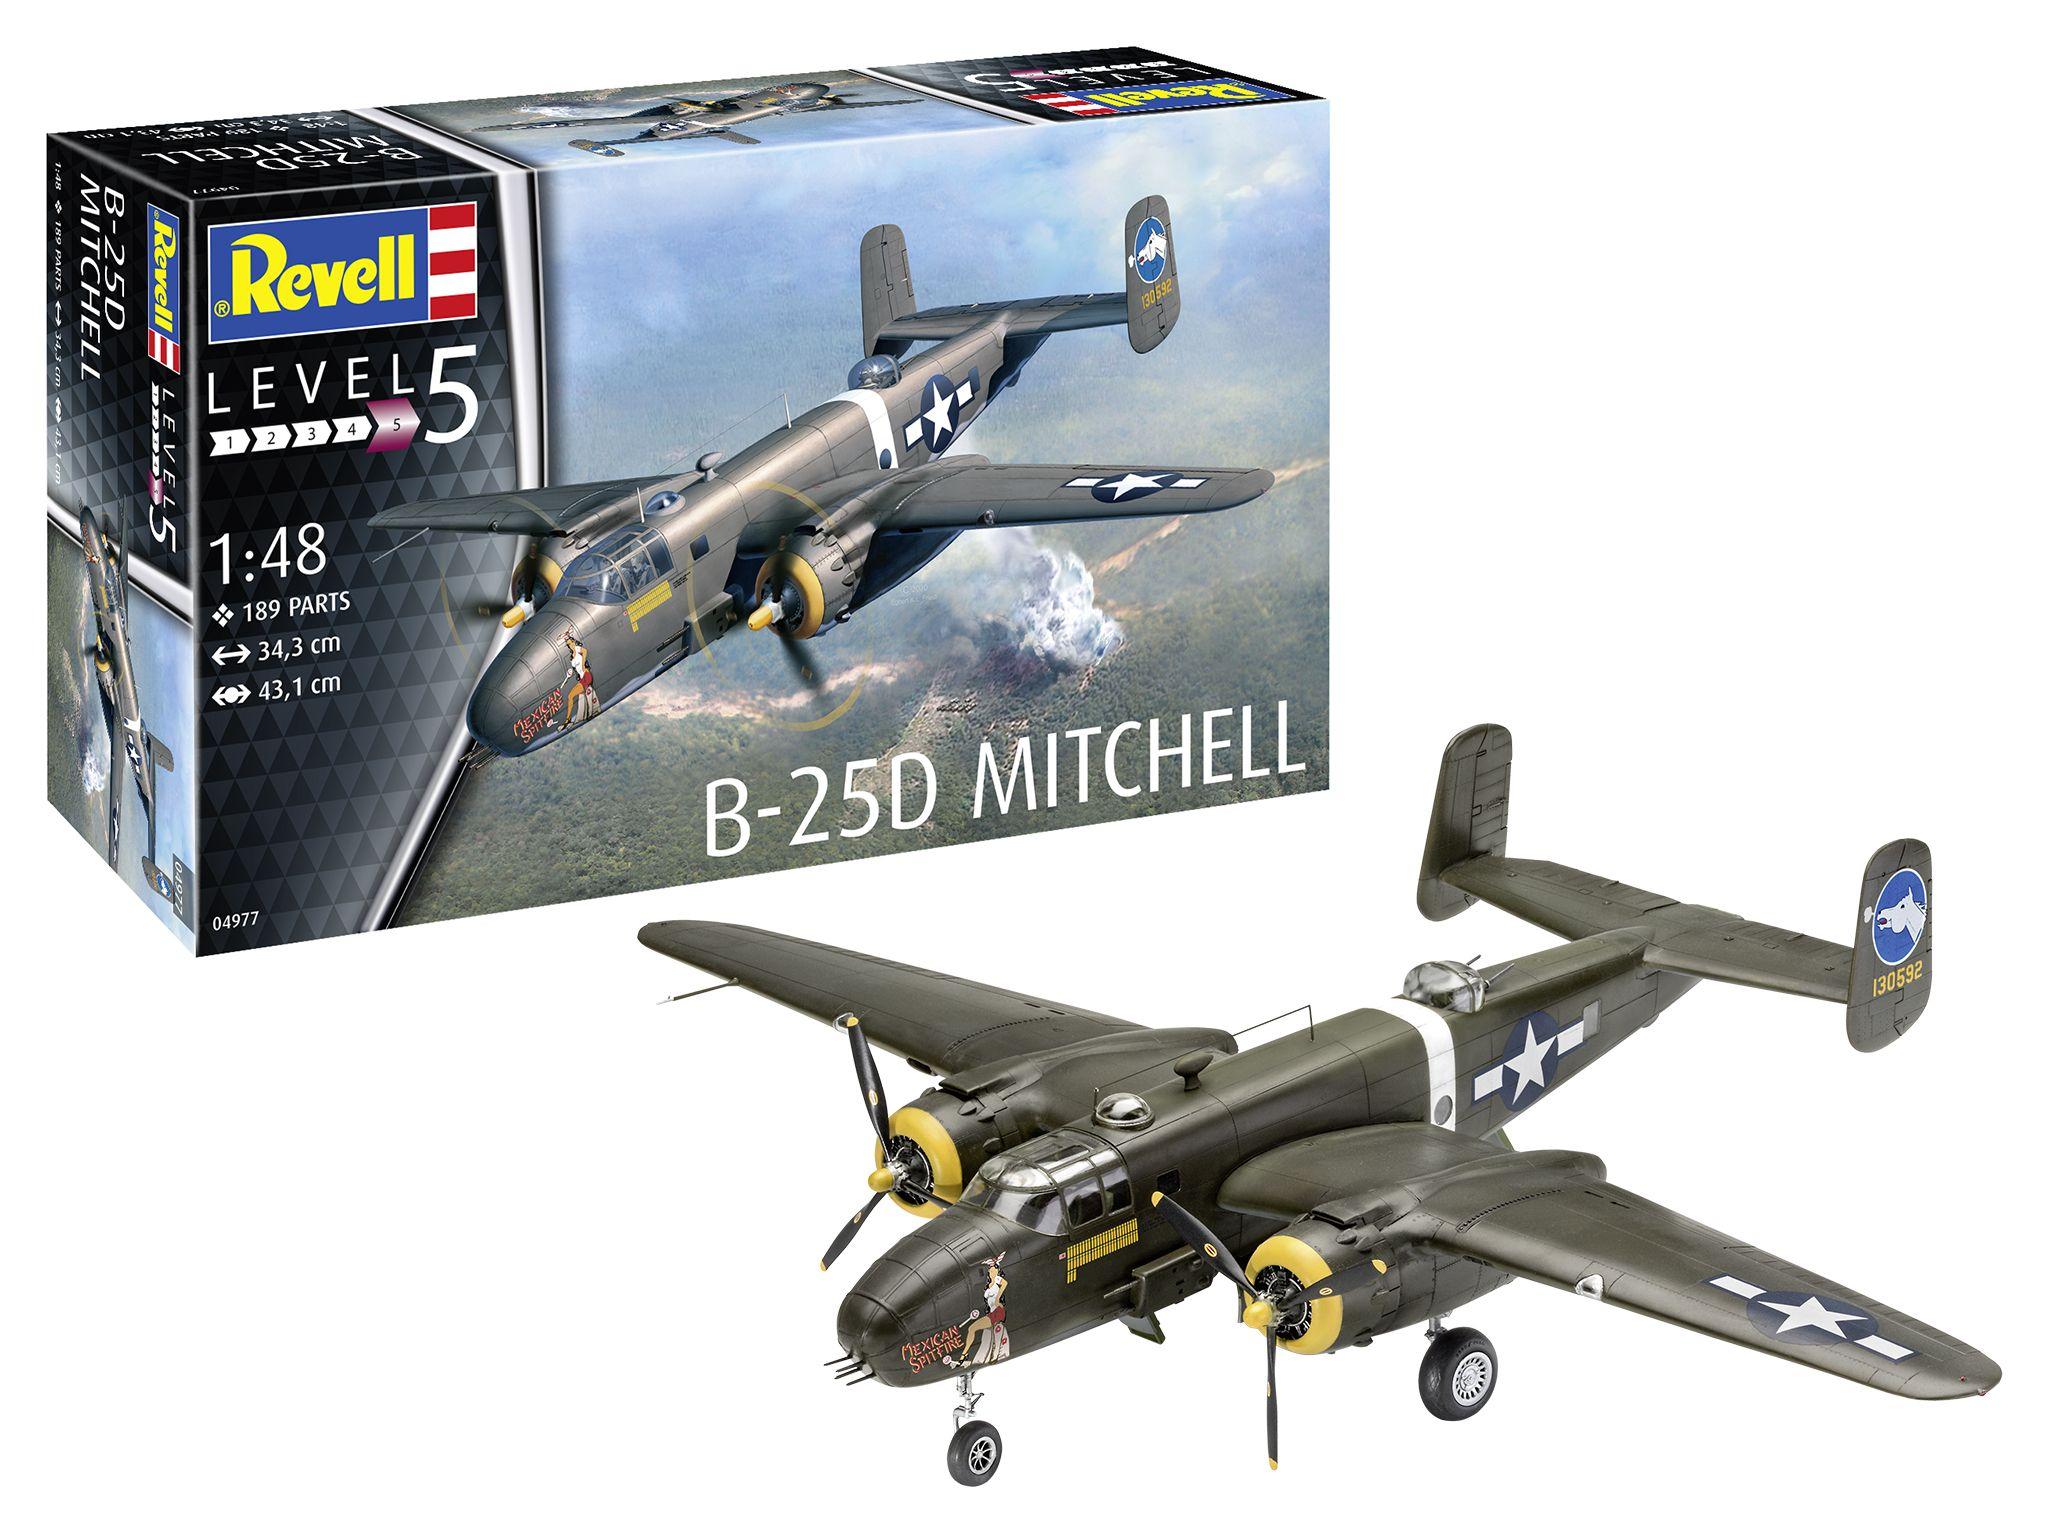 Revell B-25C D Mitchell Model Kit